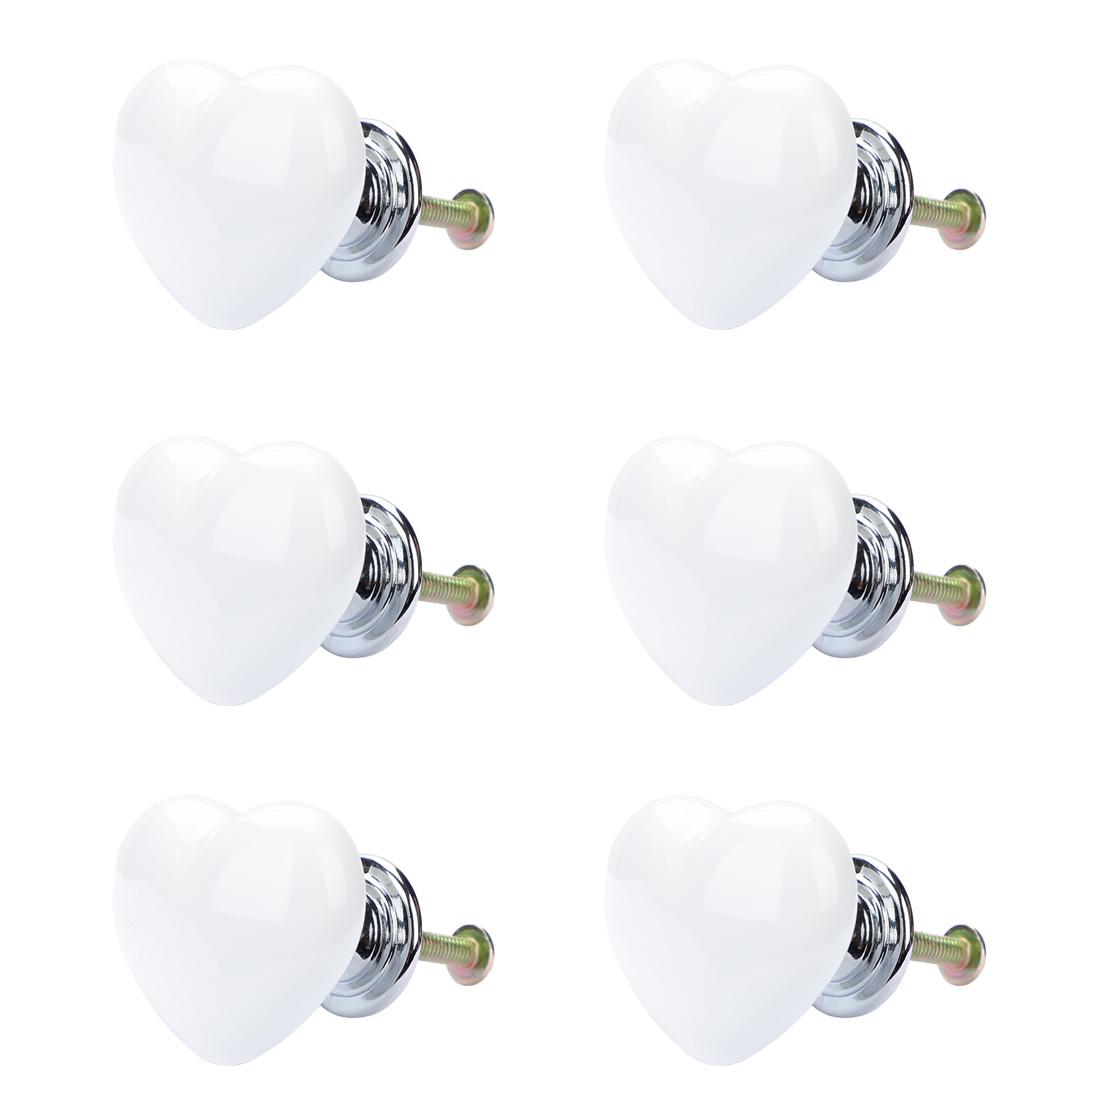 Solid Ceramic Knob Heart Shaped Drawer Pull Handle Cupboard Wardrobe 6pcs White